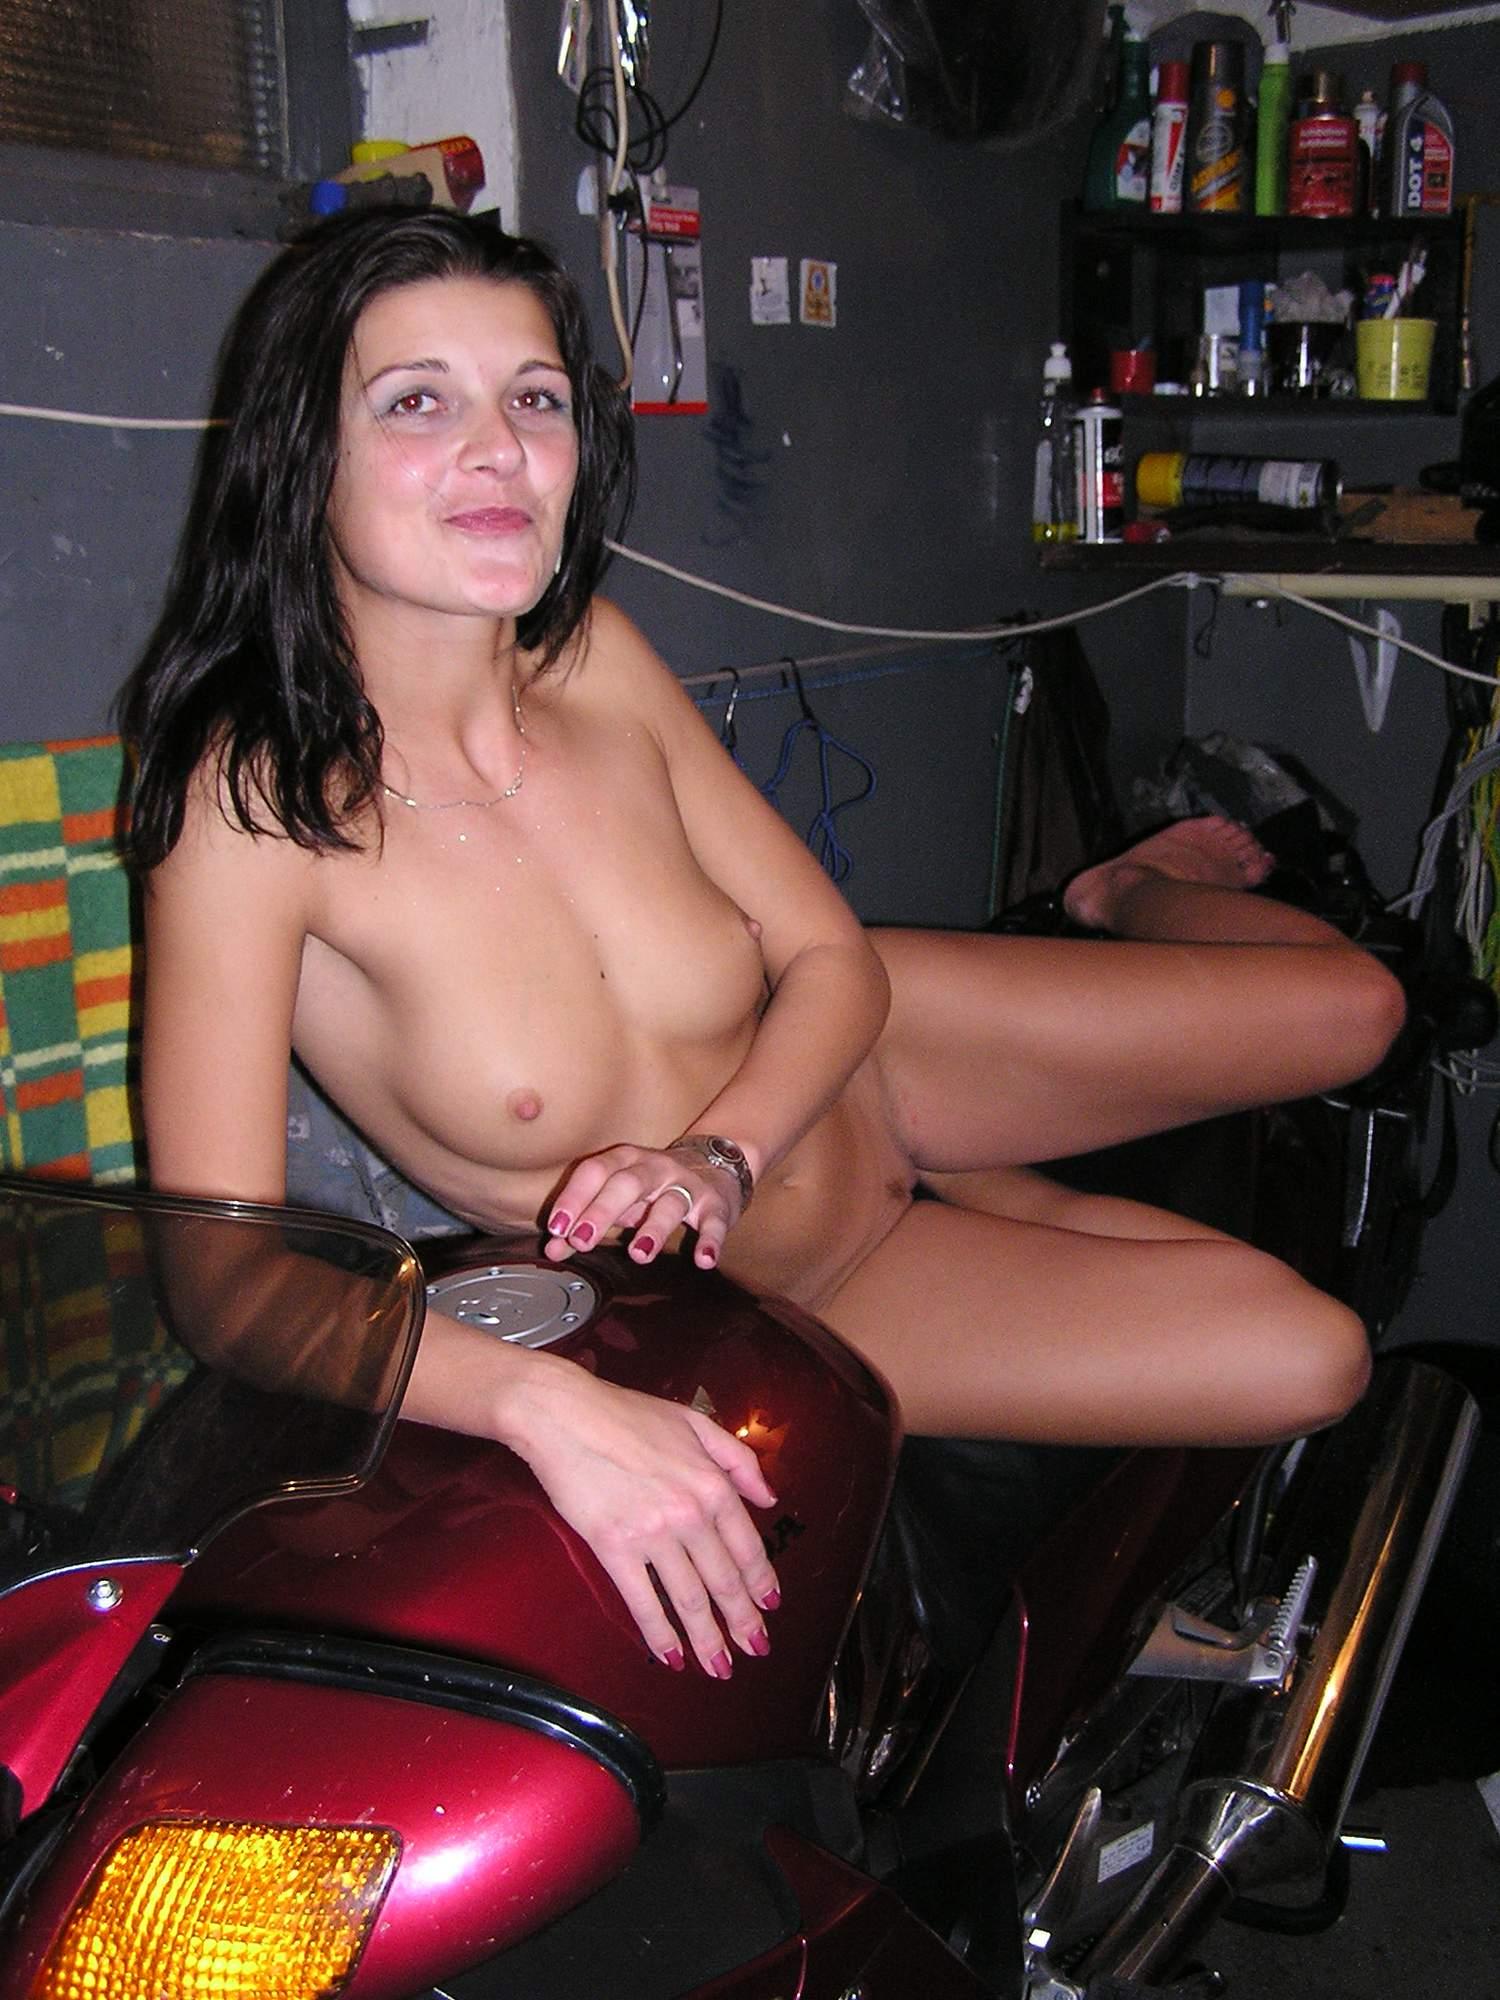 http://img20.rajce.idnes.cz/d2001/13/13300/13300599_db0162368d46d681434a4cd79b4f4245/images/Rotation_of_P1010037.jpg